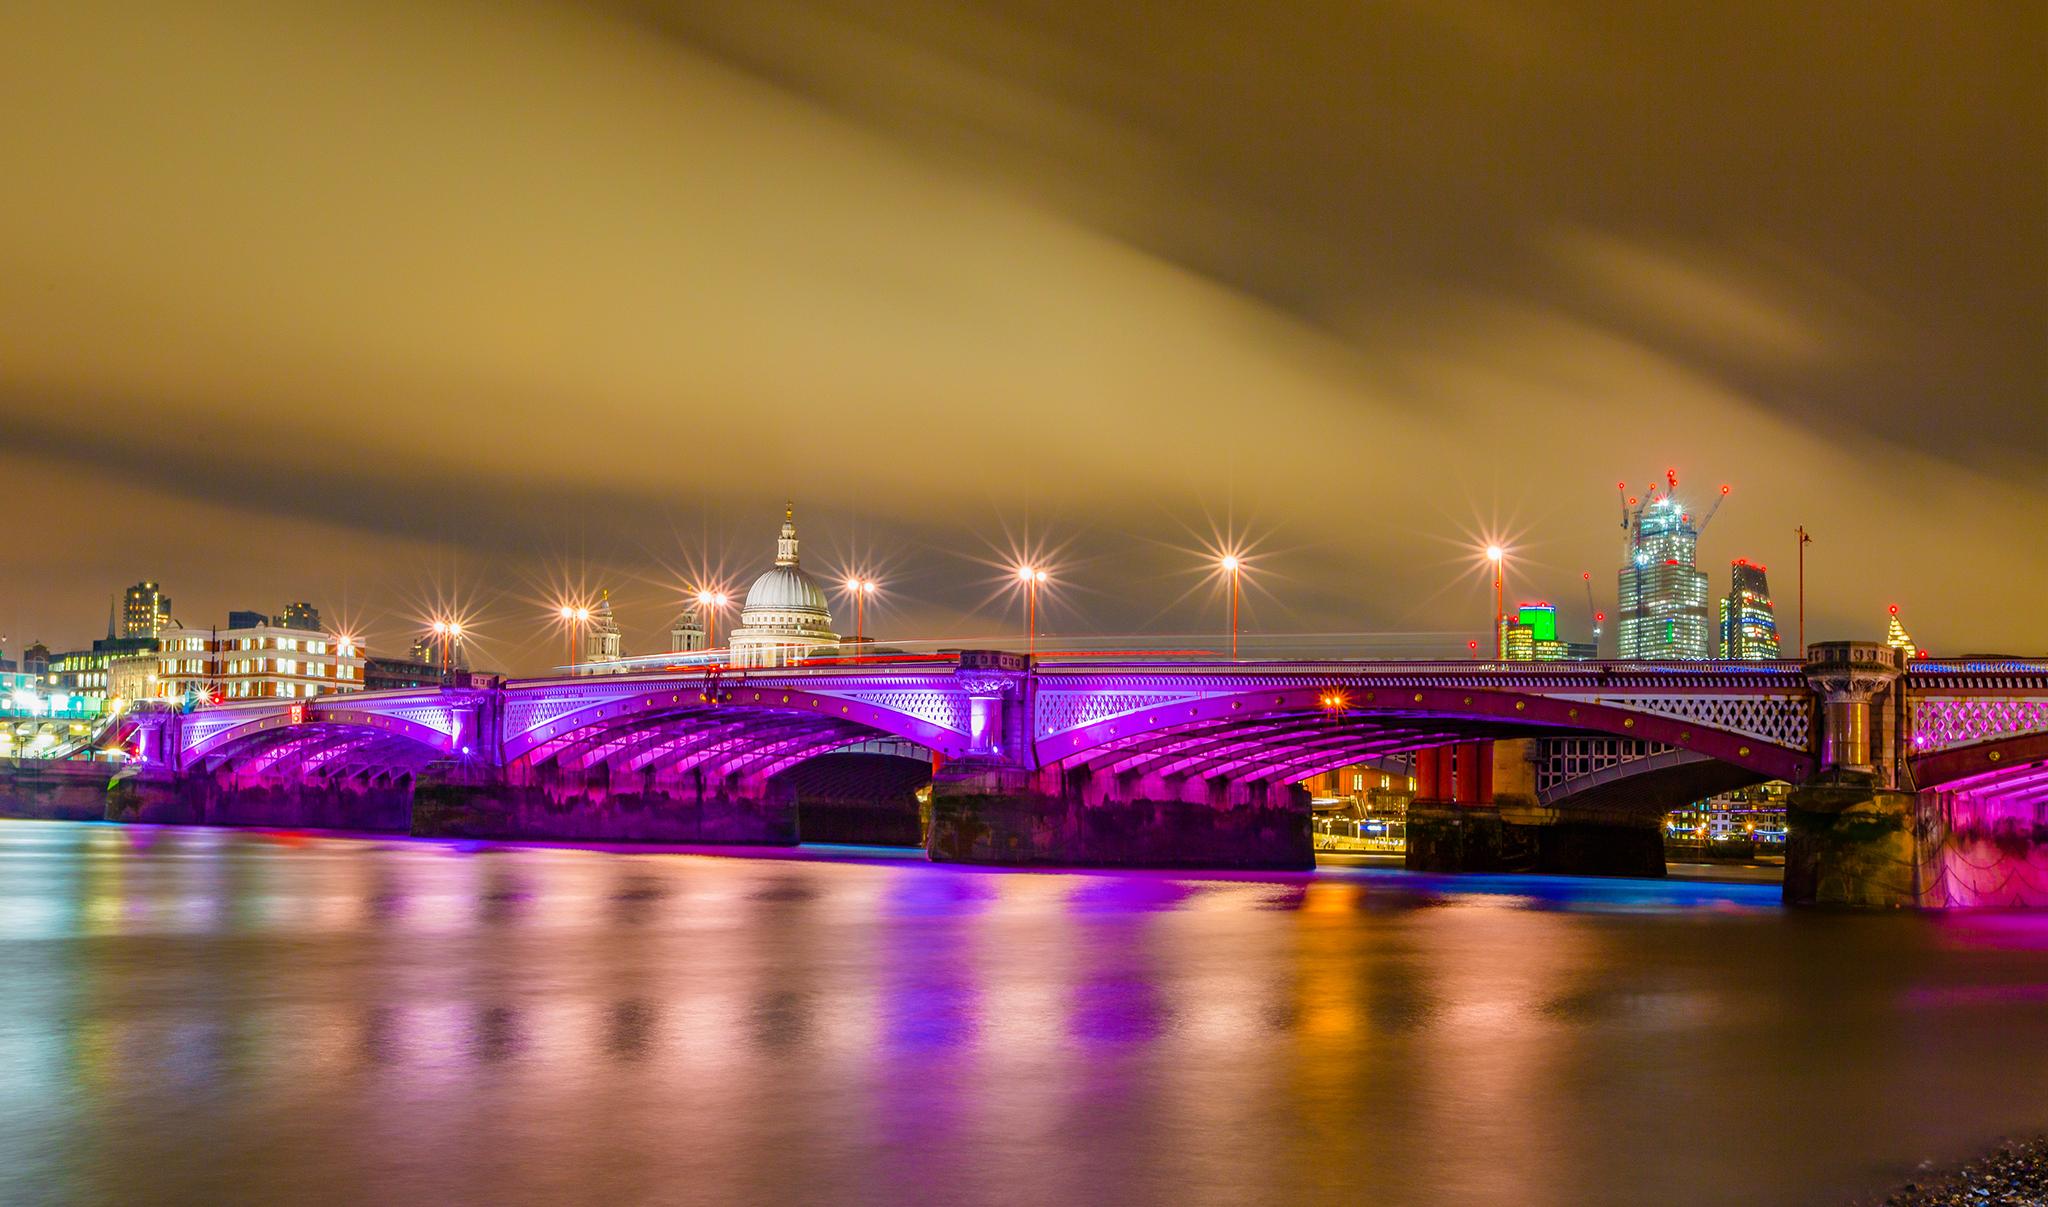 Blackfriars Bridge, United Kingdom